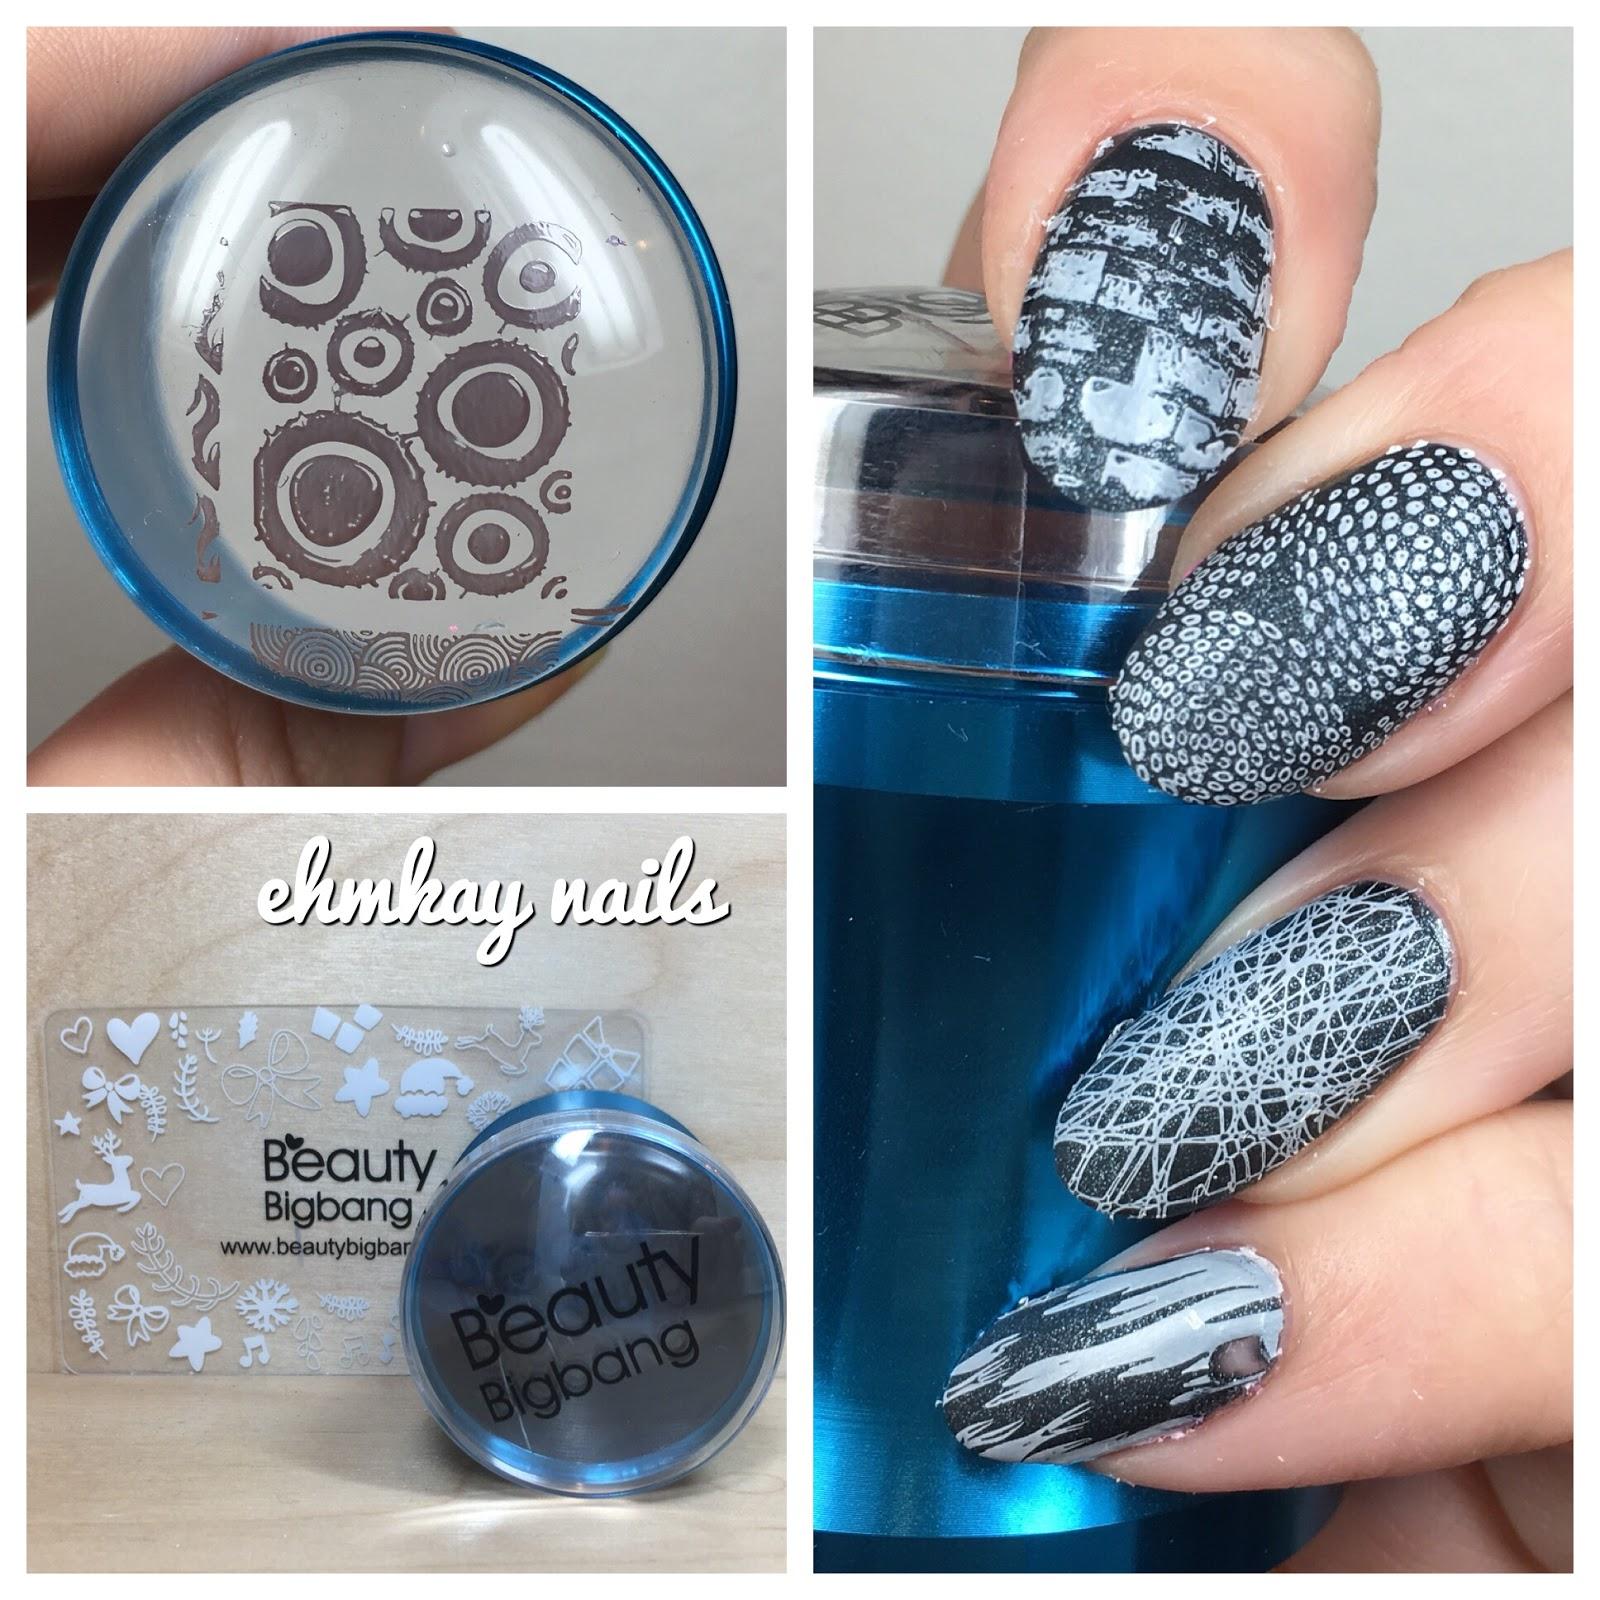 ehmkay nails: Beauty Big Bang Metal Nail Art Stamper and Scraper